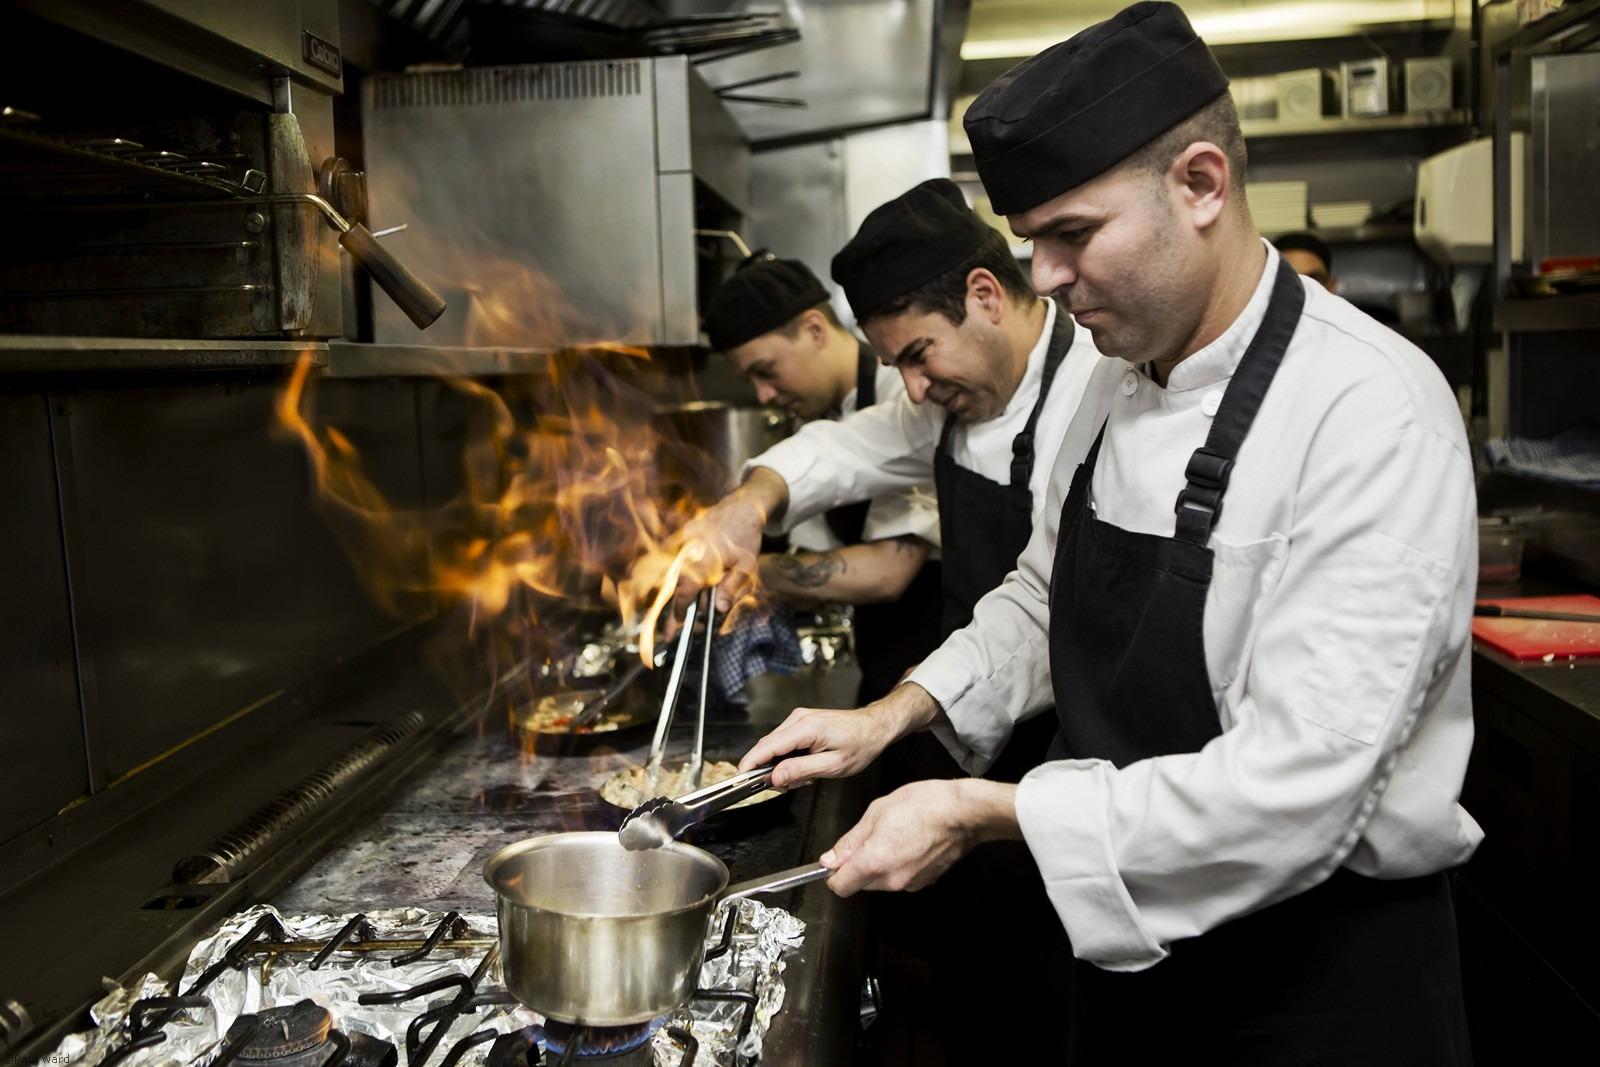 Chefs at work by Birmingham portrait photographer Paul Ward